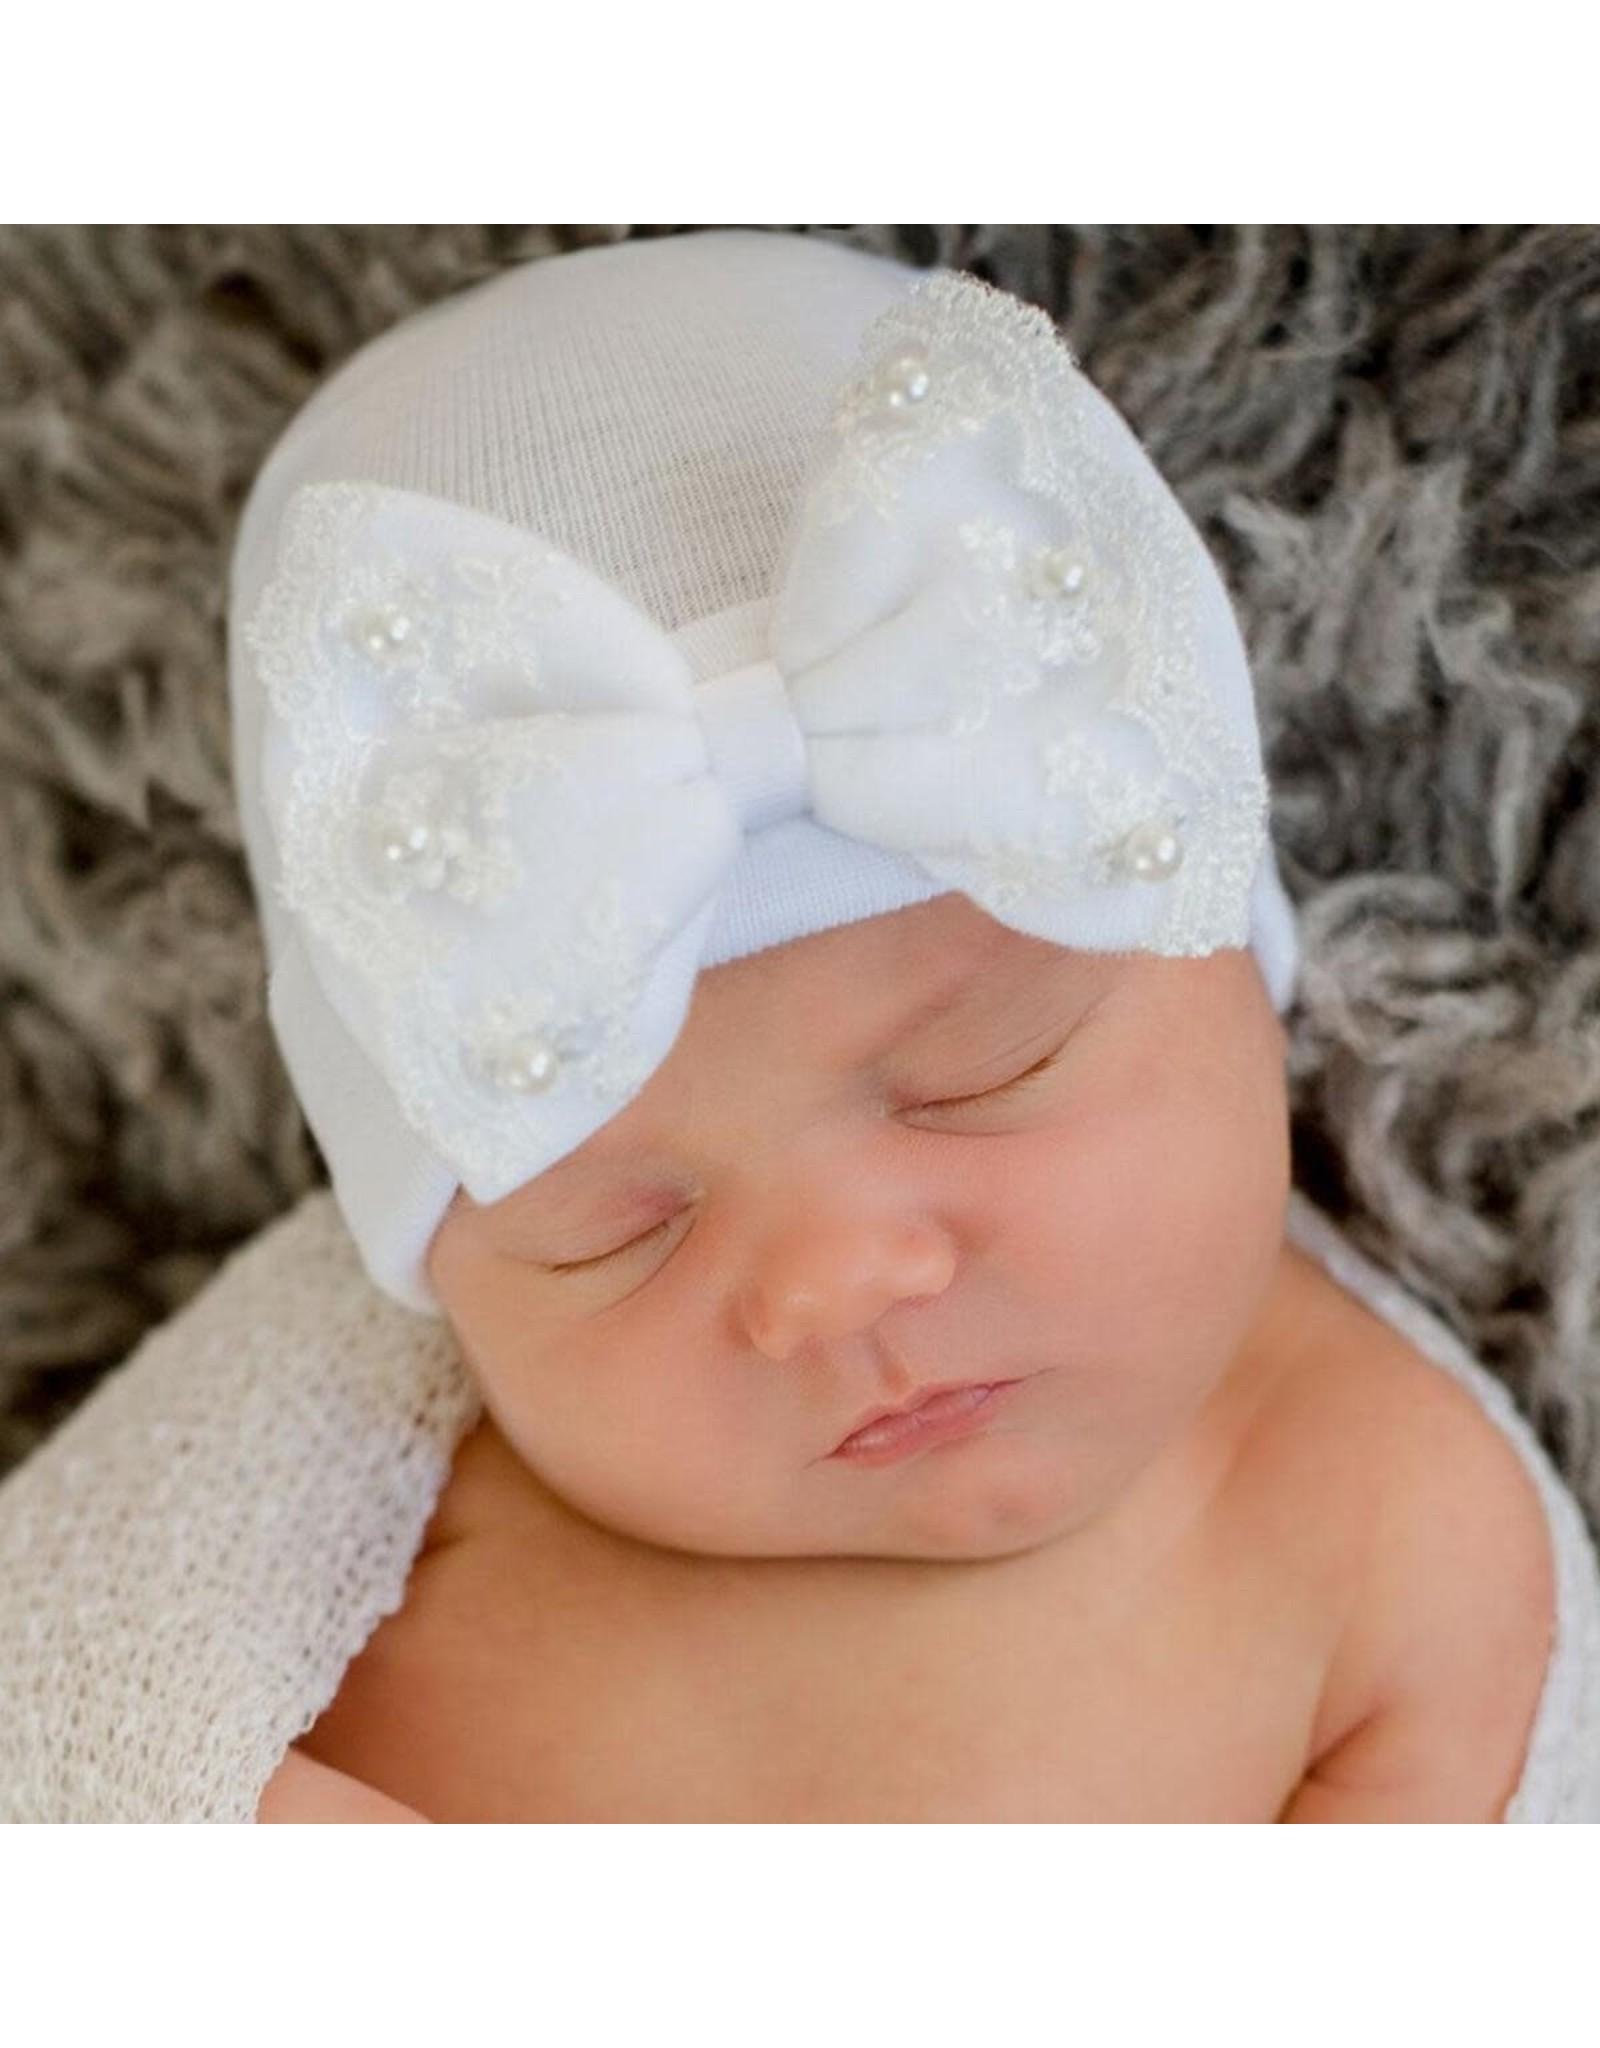 ILYBEAN Ilybean- Pearl & Lace Bow Nursery Beanie